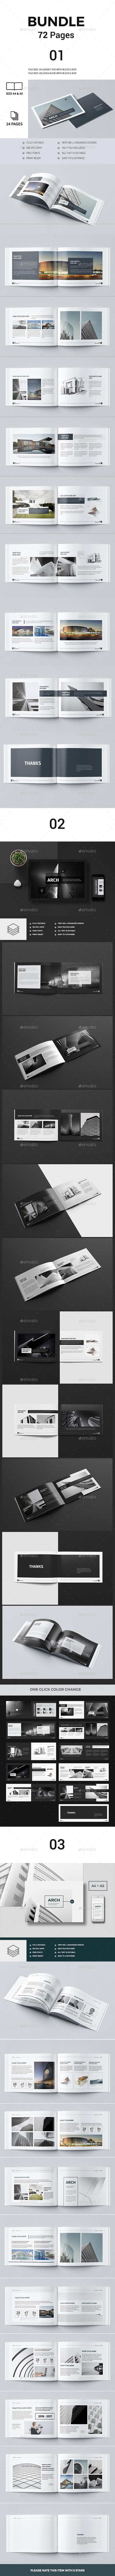 Bundle   Modern Architecture Brochures 72 Pp A4 & A5 - Brochures Print Templates